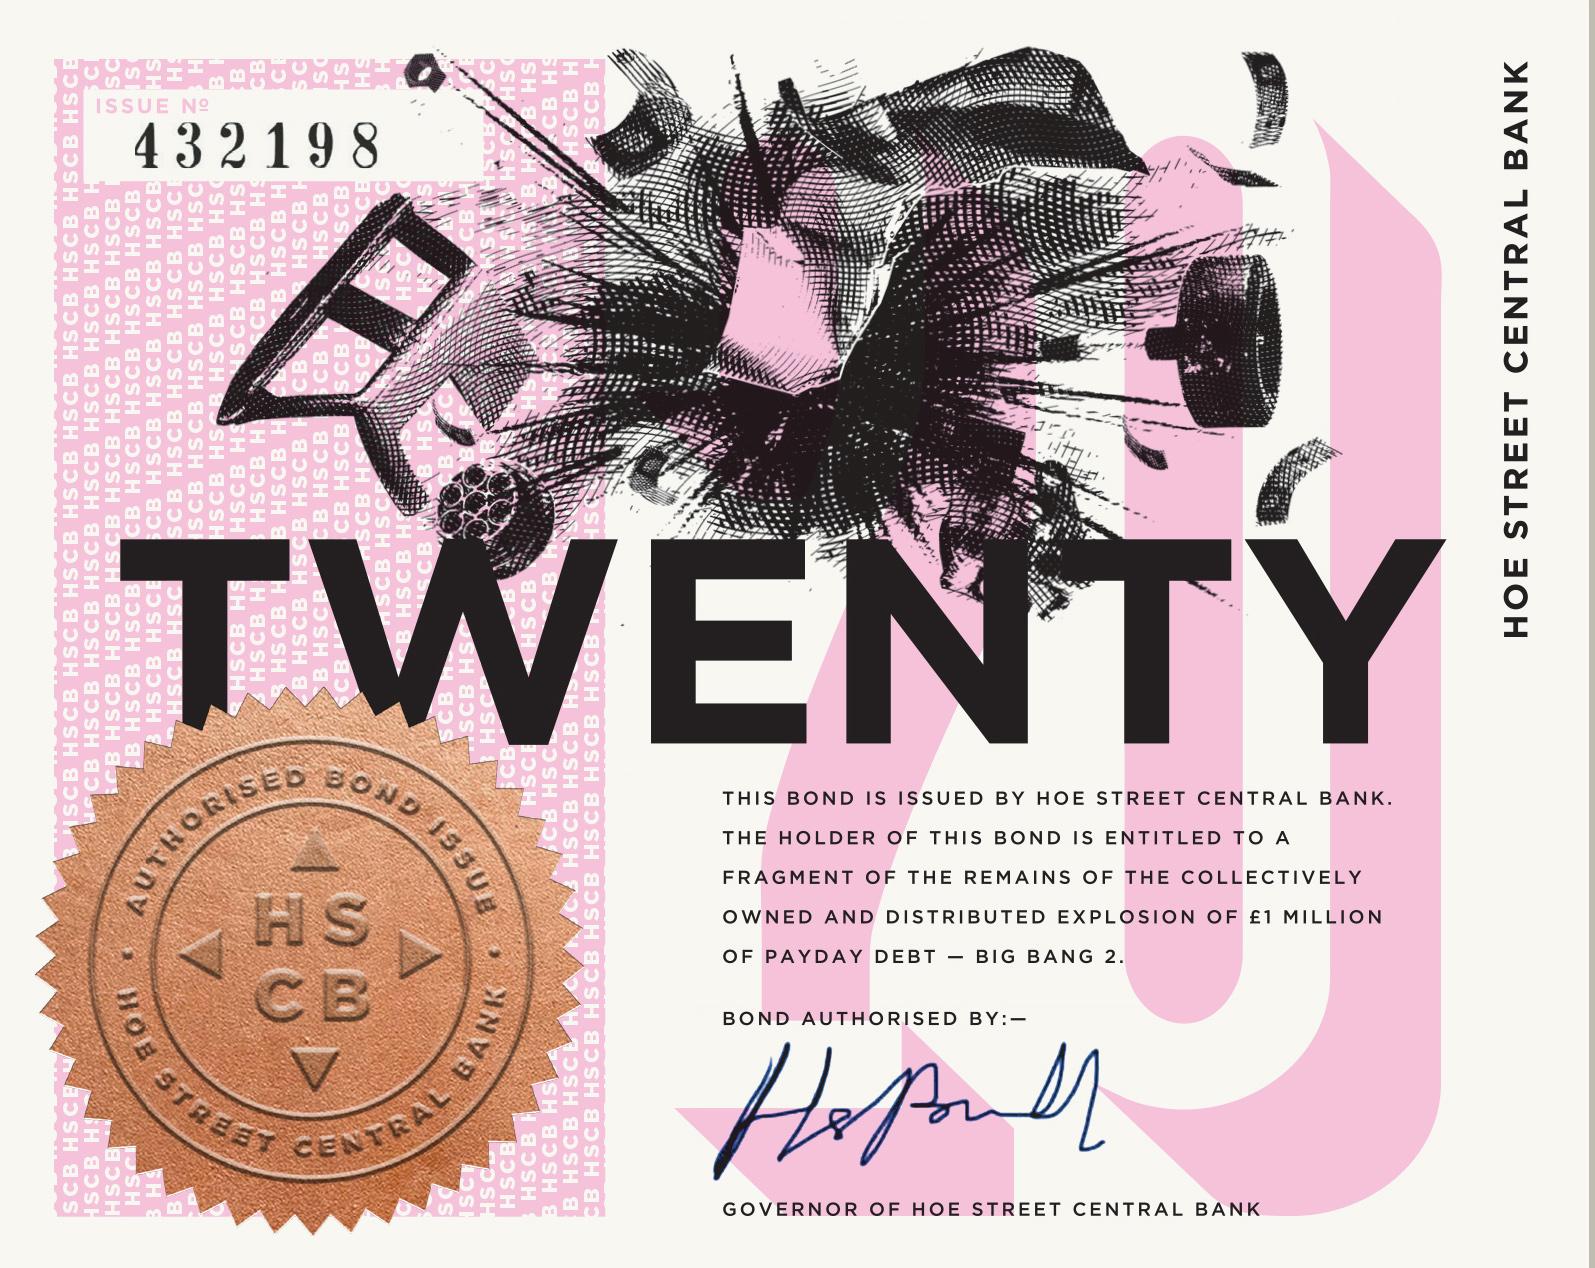 £20 HSCB BOND. 135x108mm. Pink. Screen print, letterpress, foil block, company seal. Stockwell 200gsm paper. Gilt edge.   BUY £20 BOND  . The above is a digital mockup. Return: fragment.